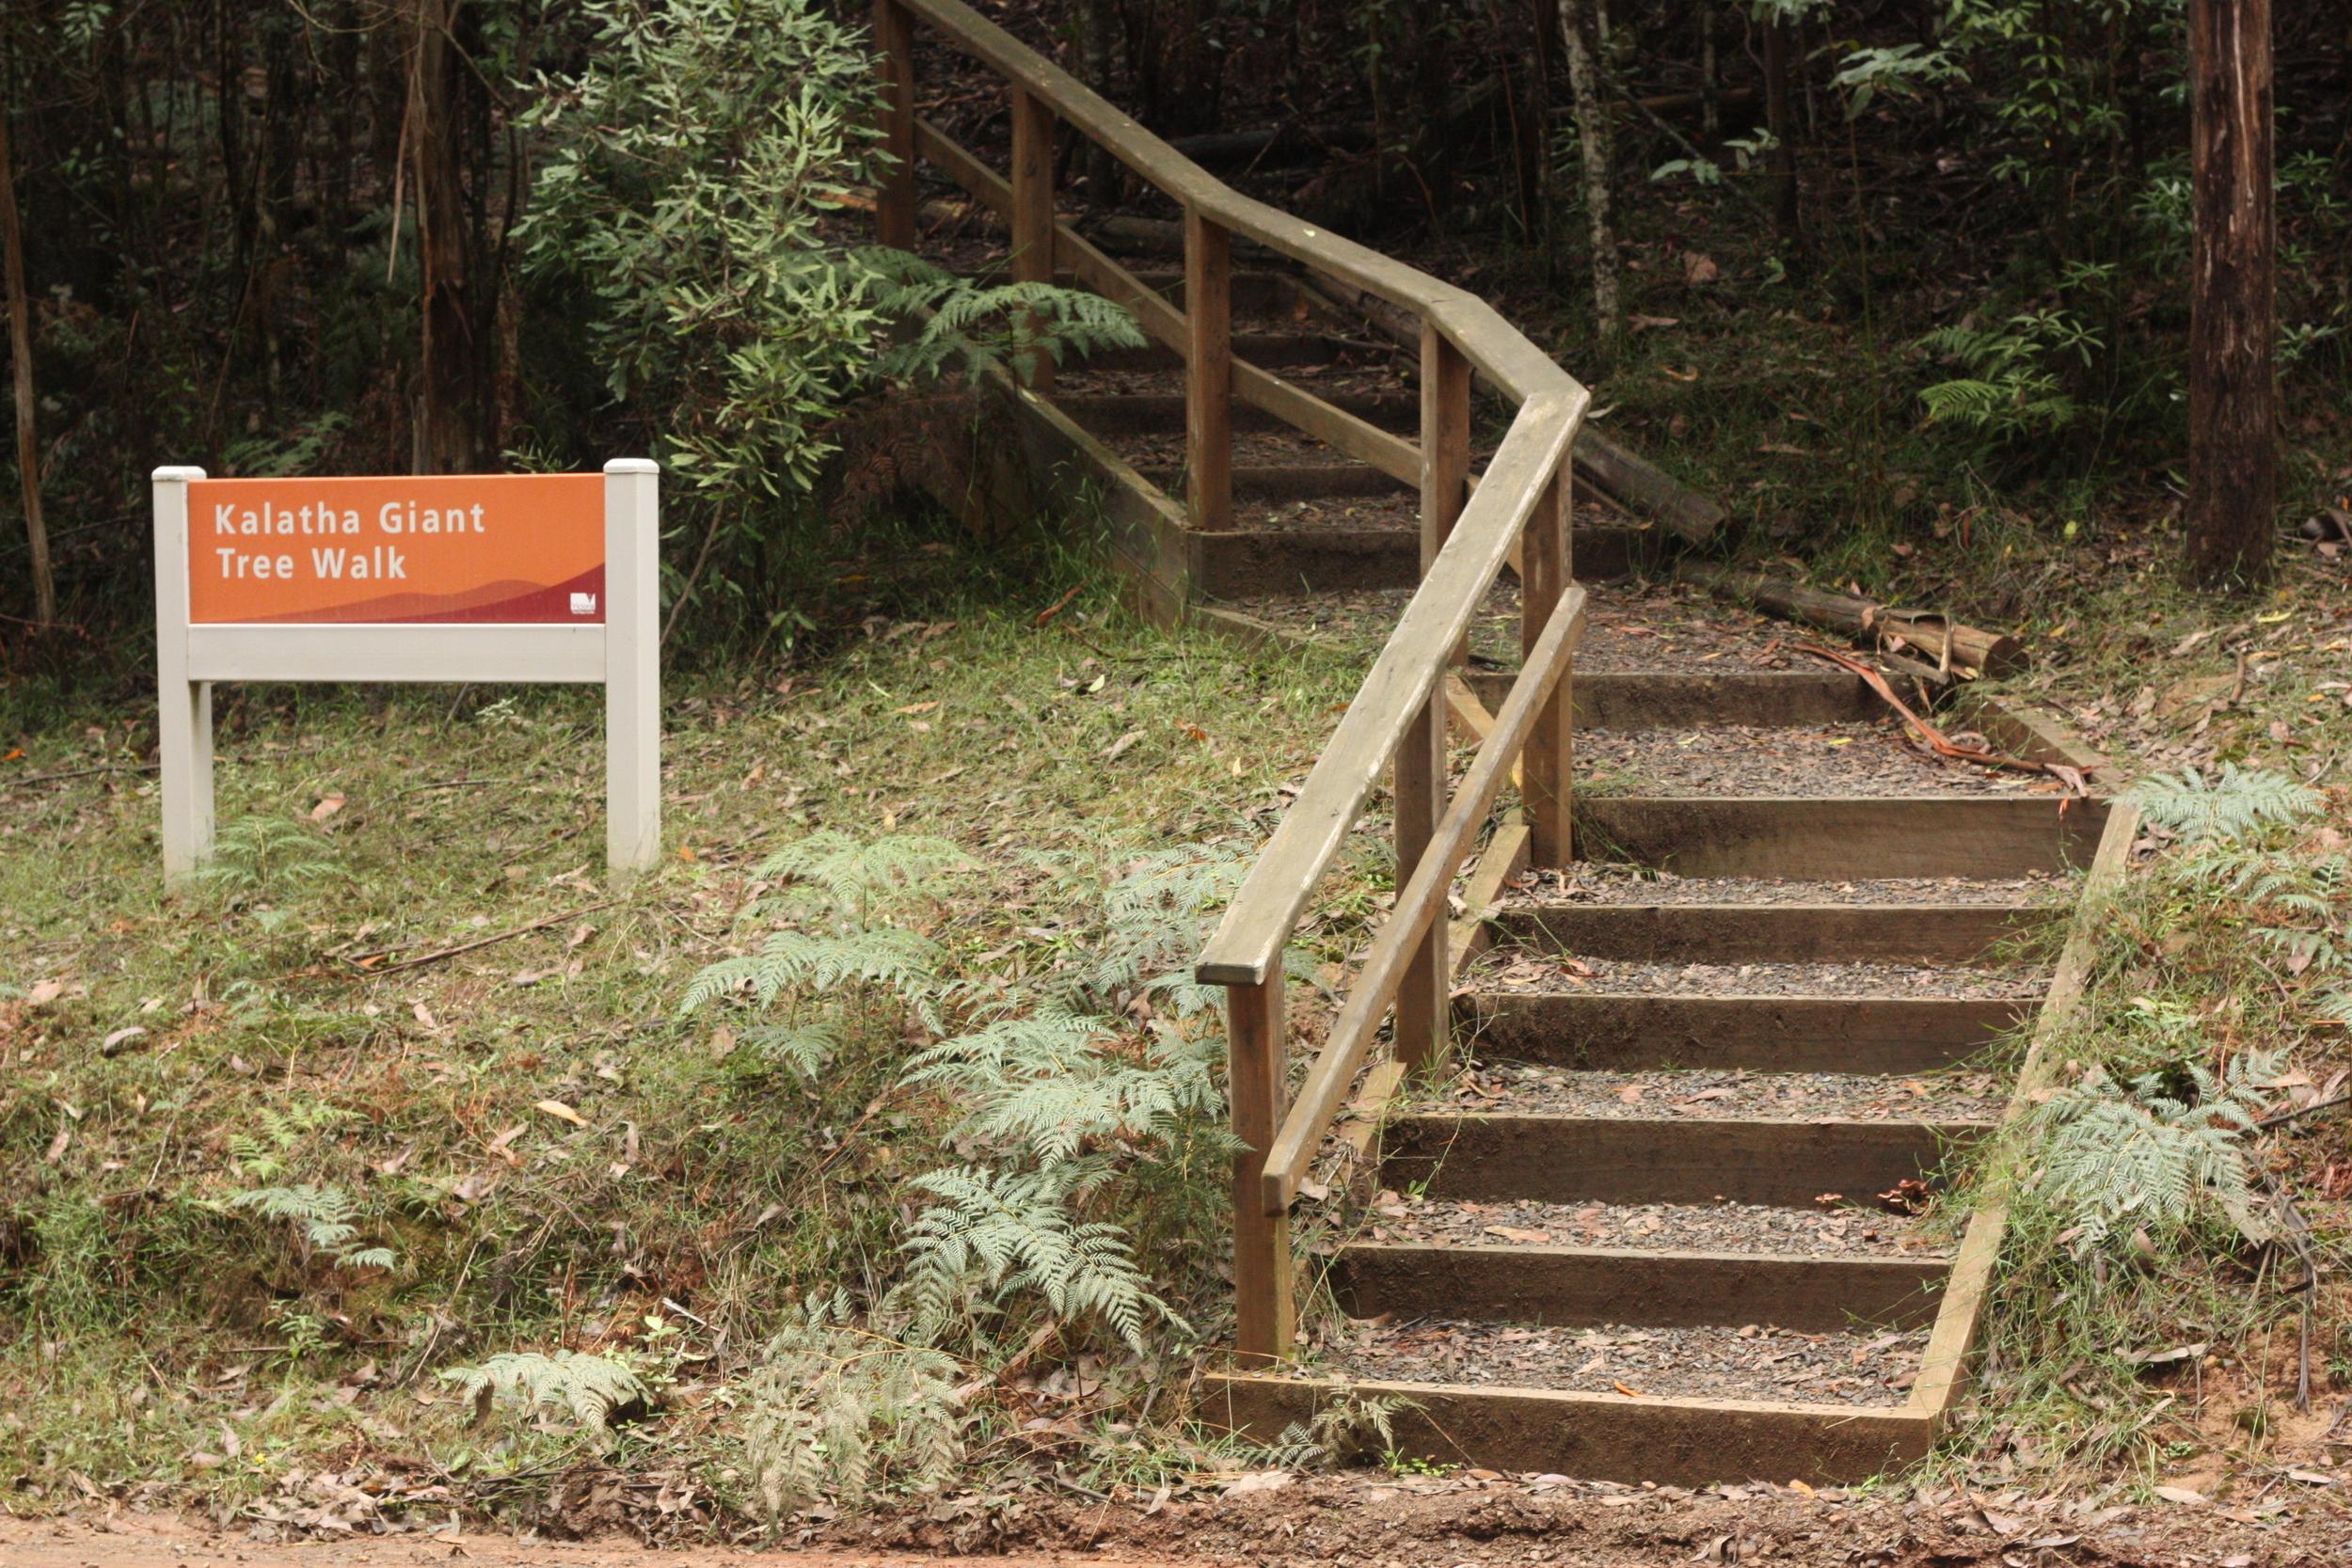 Kalatha Giant Tree Walk entrance. Photo: Alex Mullarky